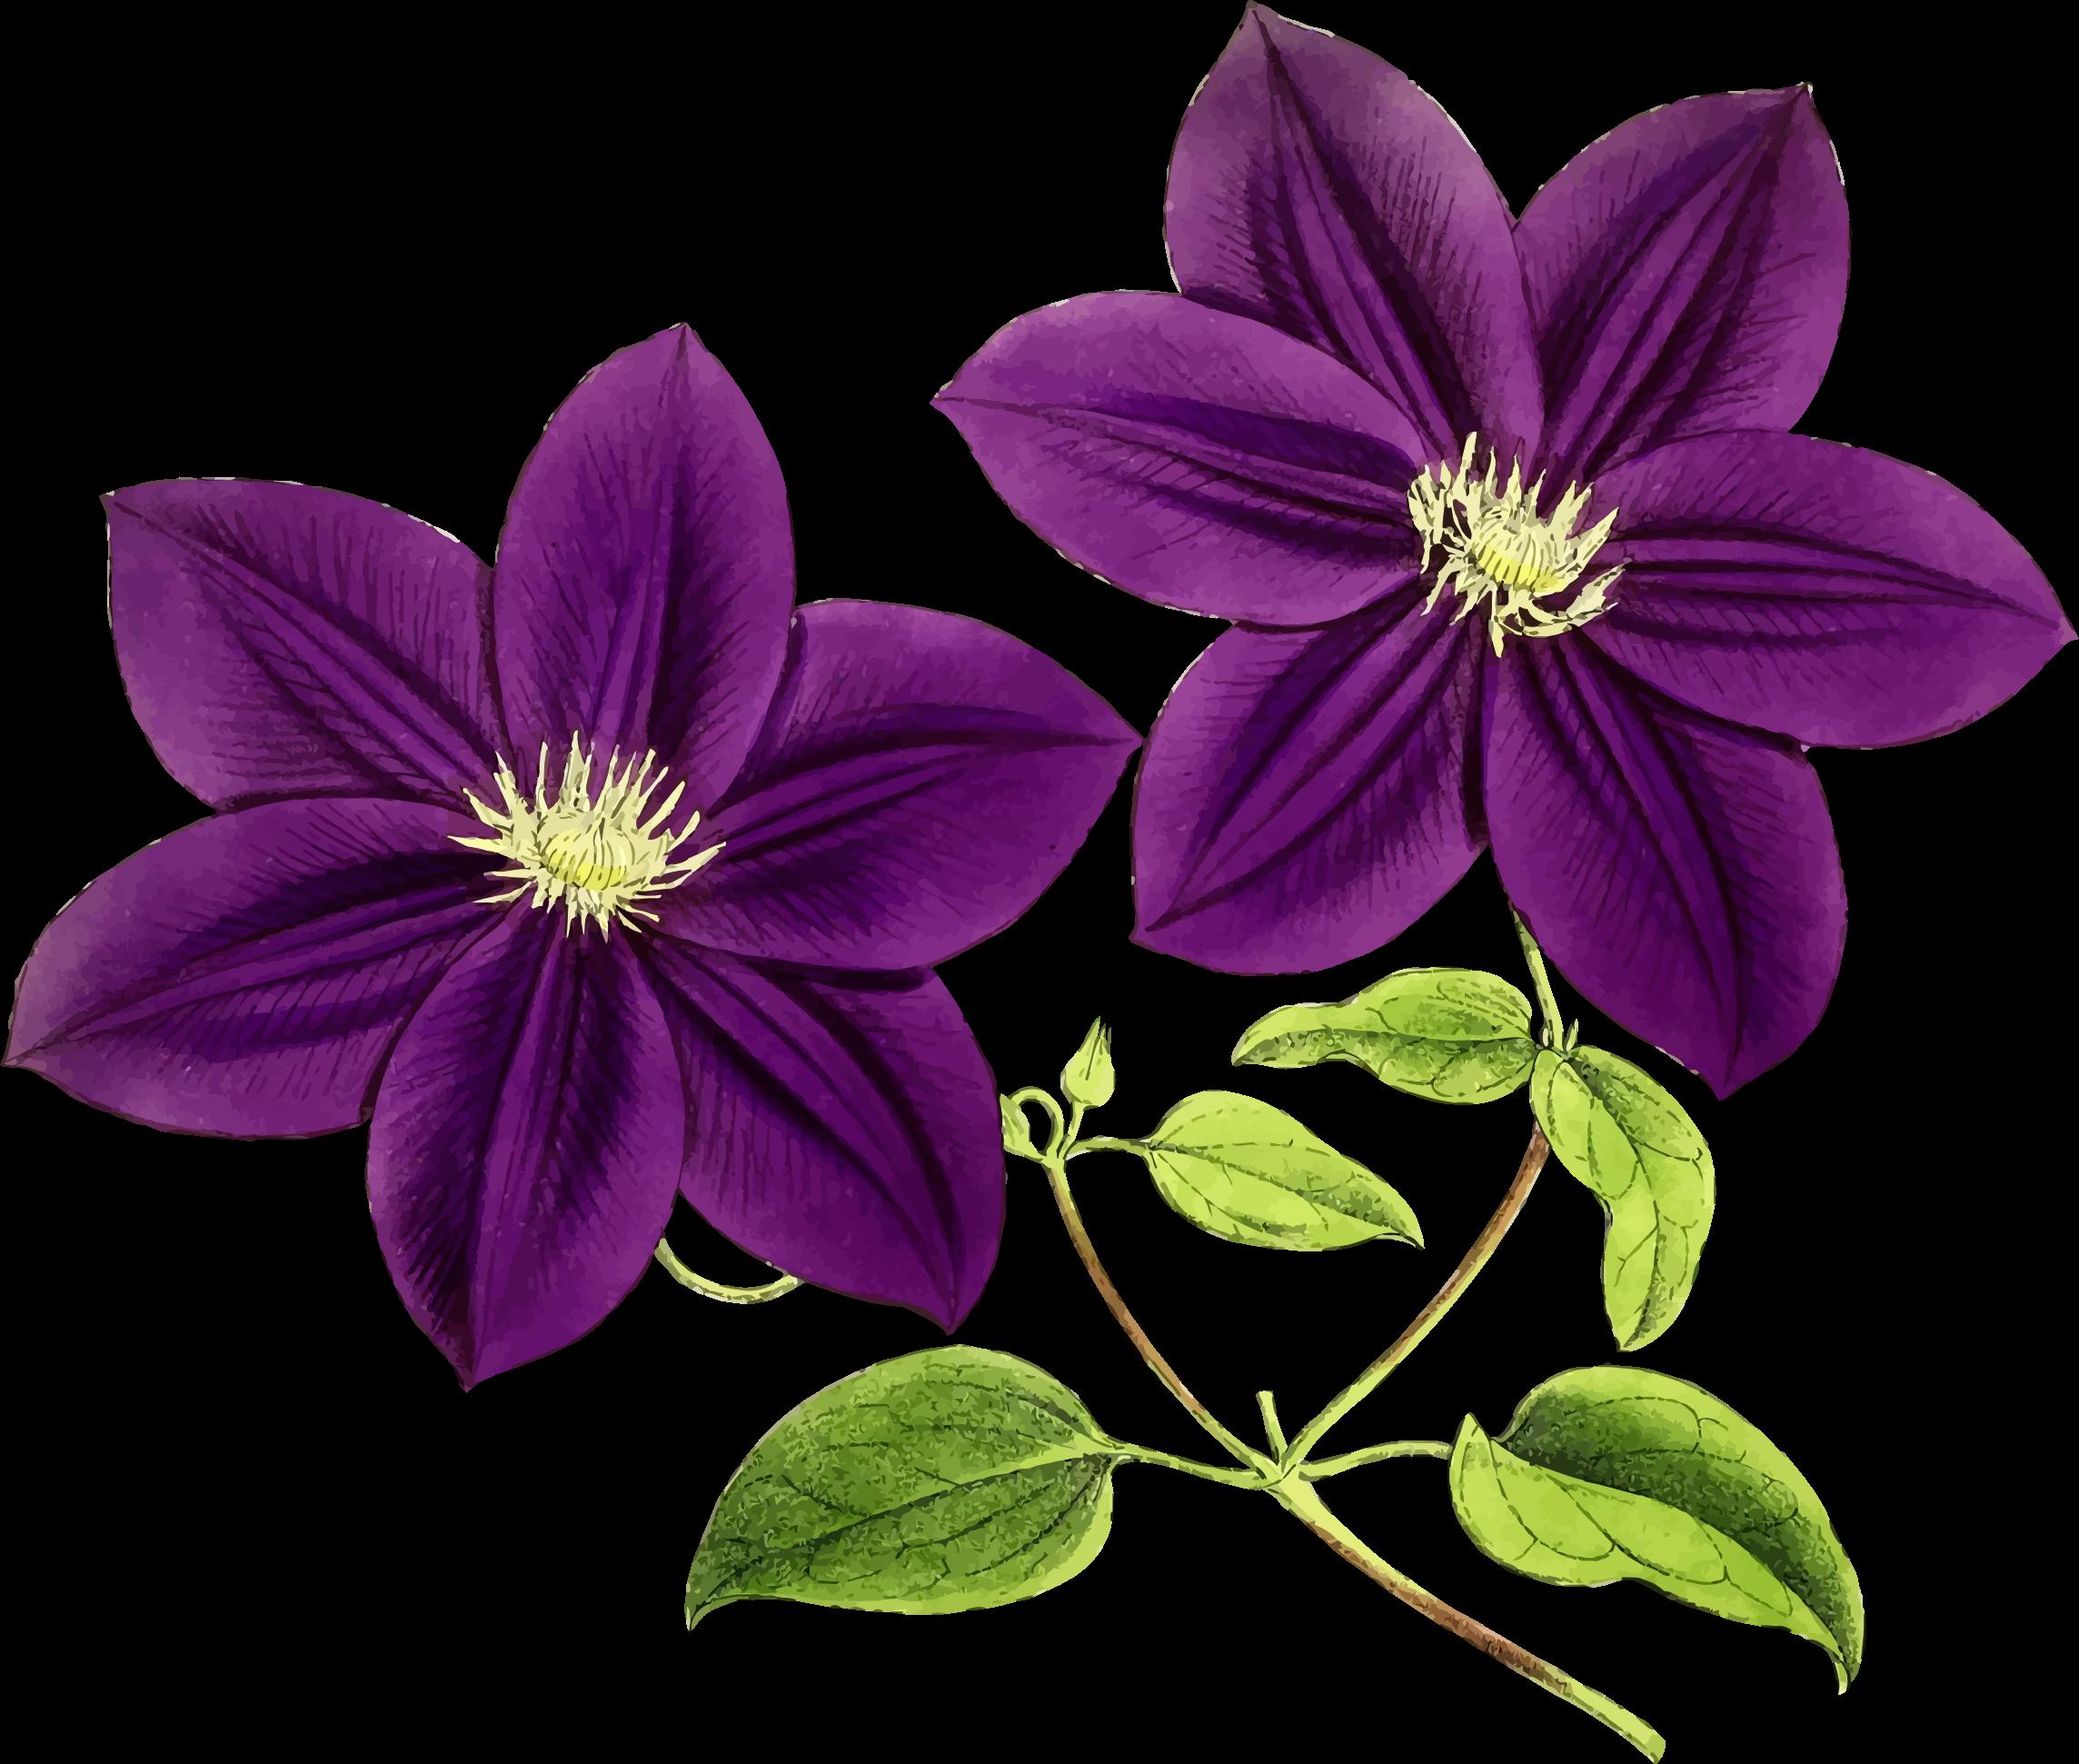 Clipart Purple Flowers Pozickyprovidentfo Gallery